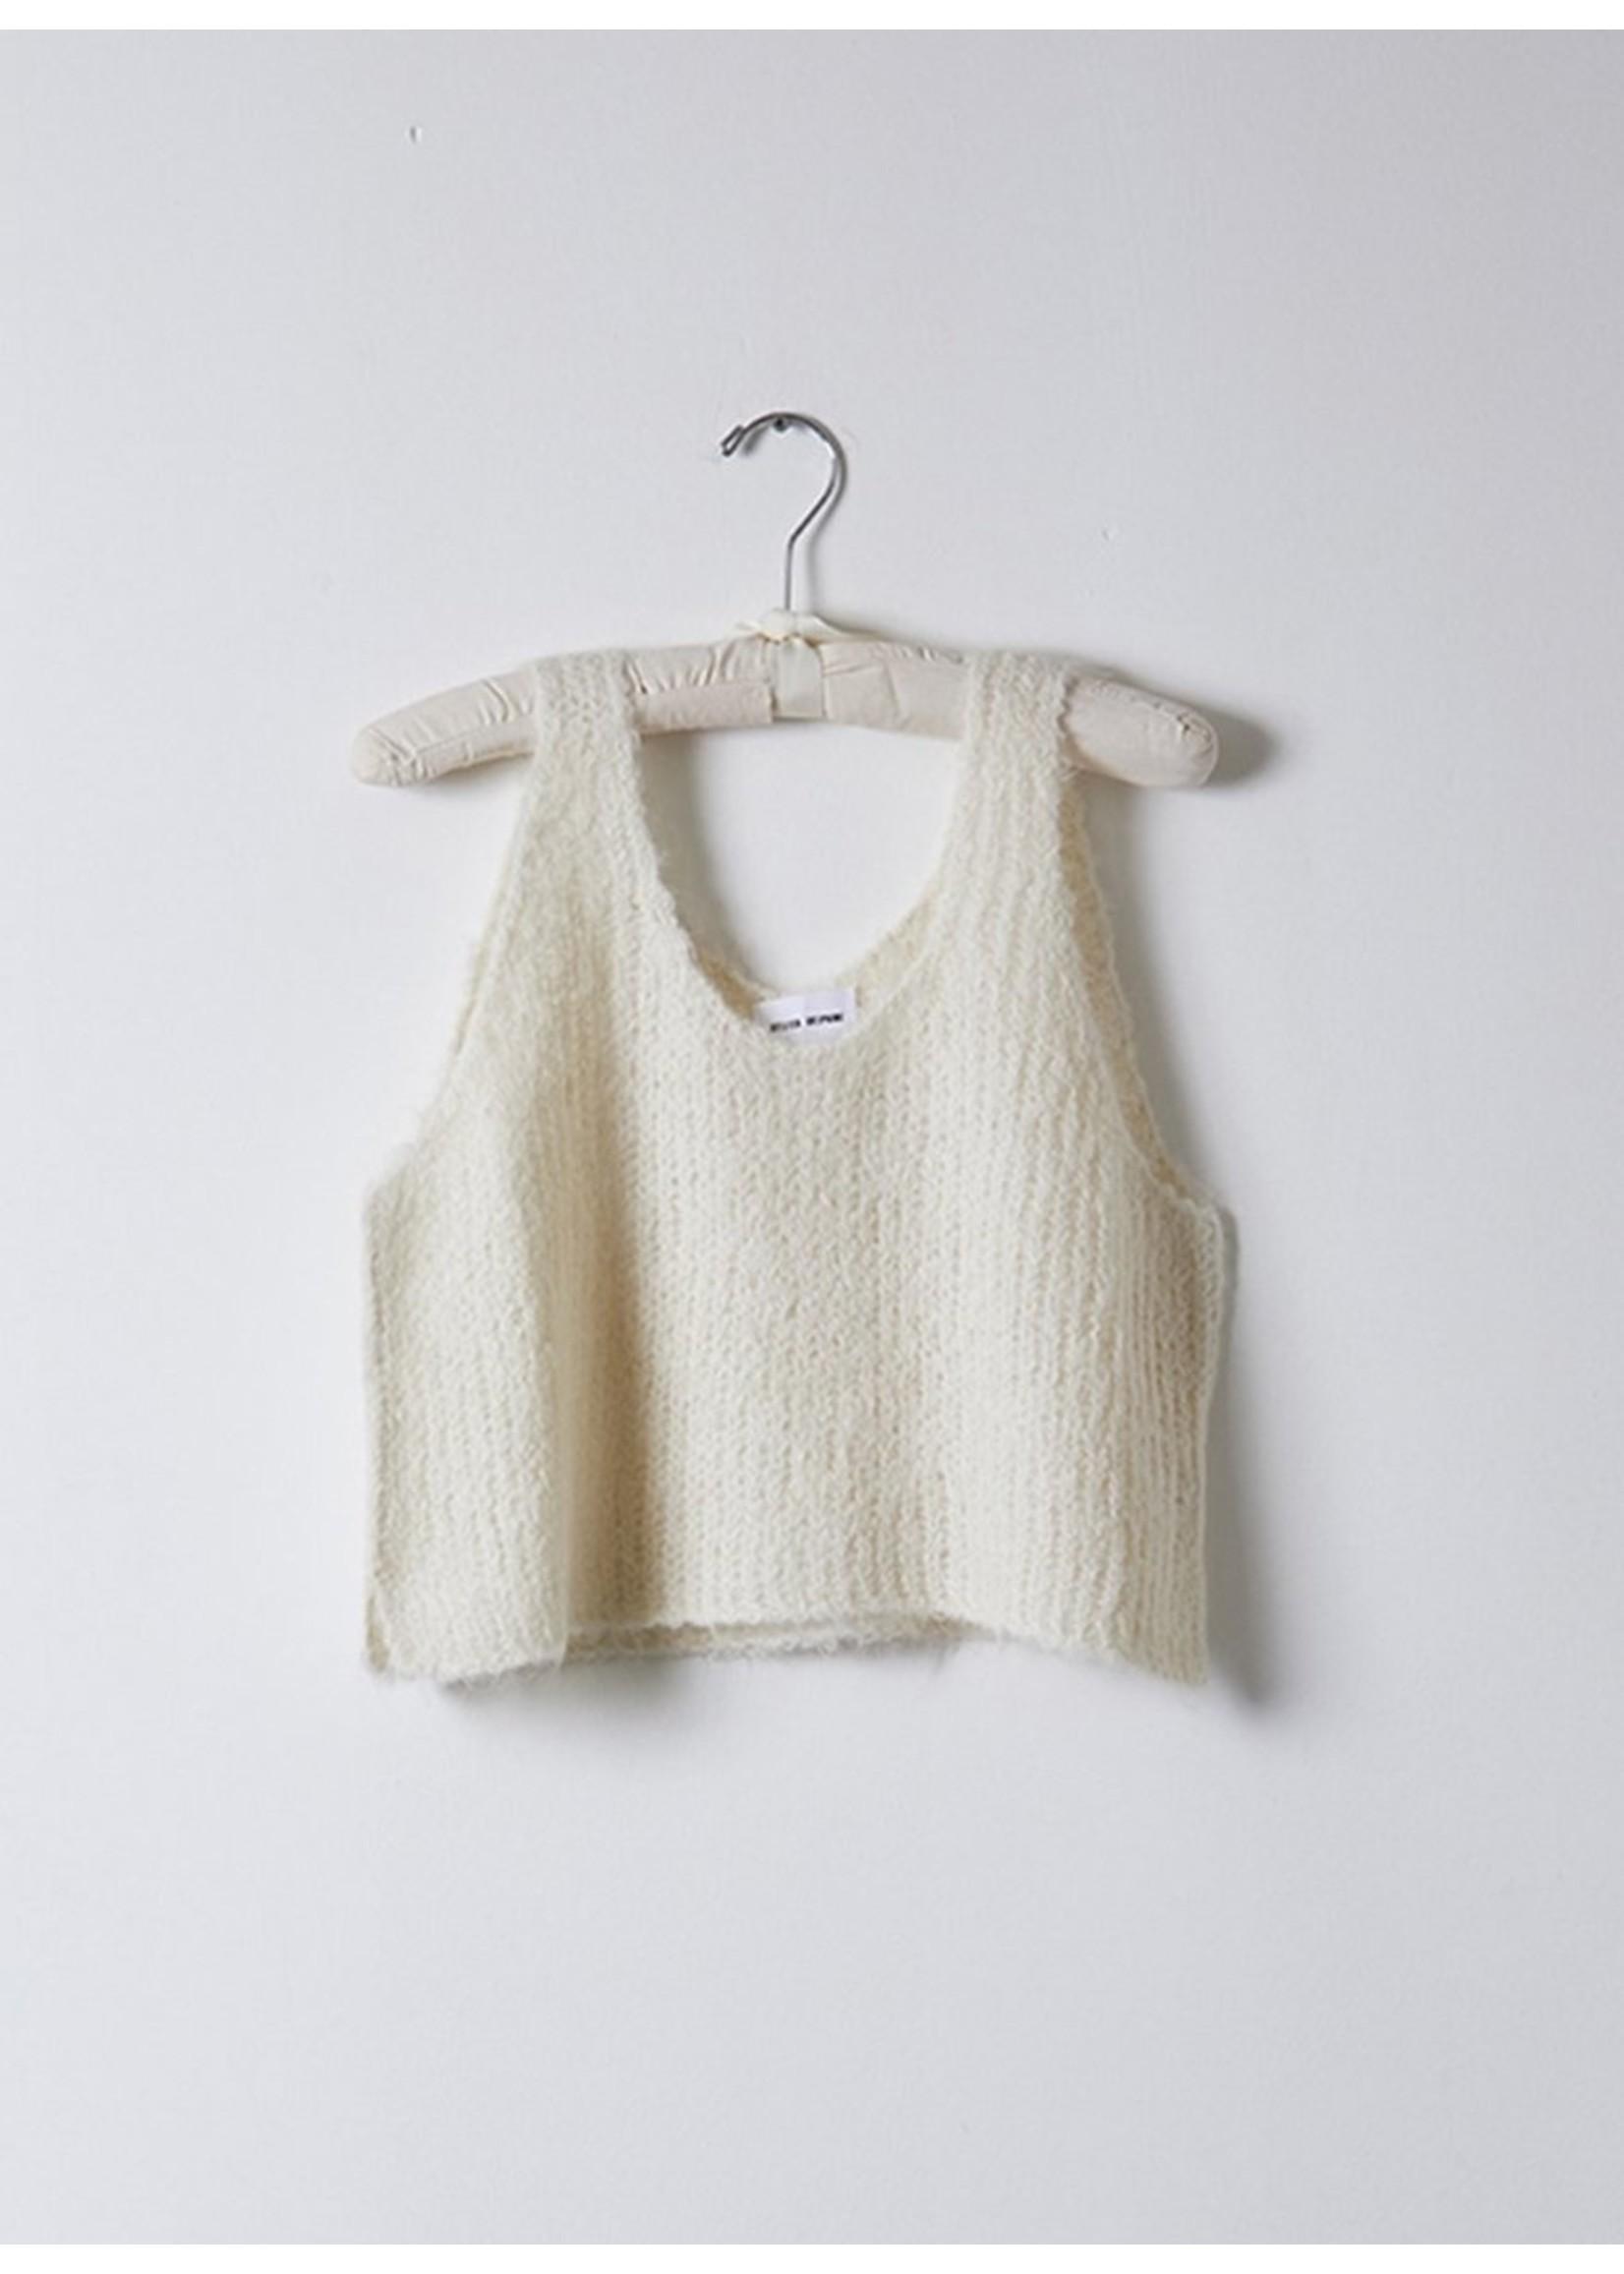 Atelier Delphine Atelier Delphine Cream Sweater Tank